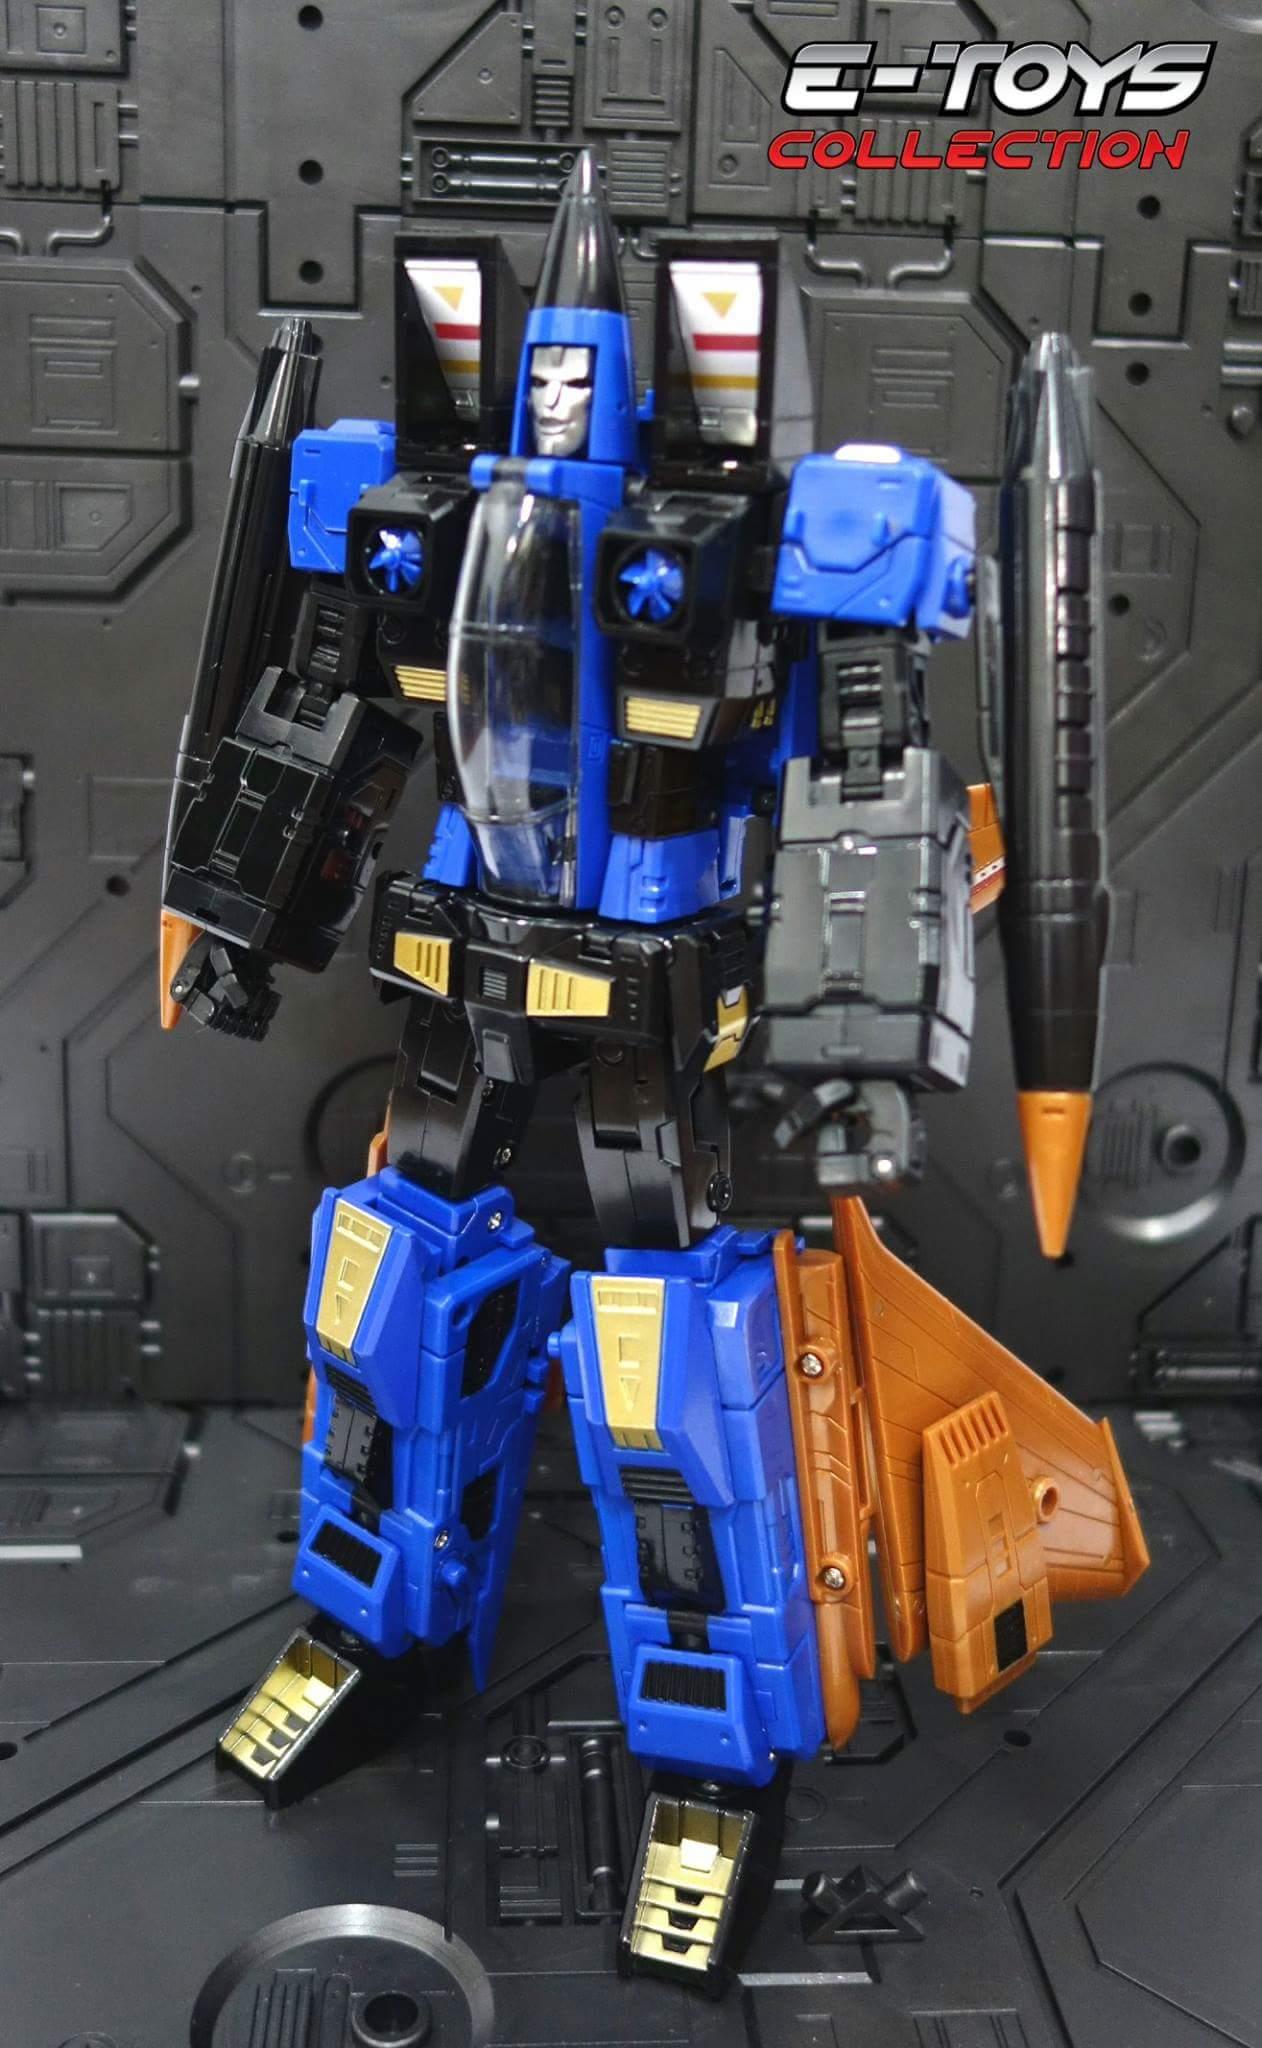 [ToyWorld] Produit Tiers - TW-M02A Combustor (Ramjet/Statoréacto), TW-M02B Assault (Thrust/Fatalo), TW-M02C Requiem (Dirge/Funébro) - Page 3 CUa1aQPY